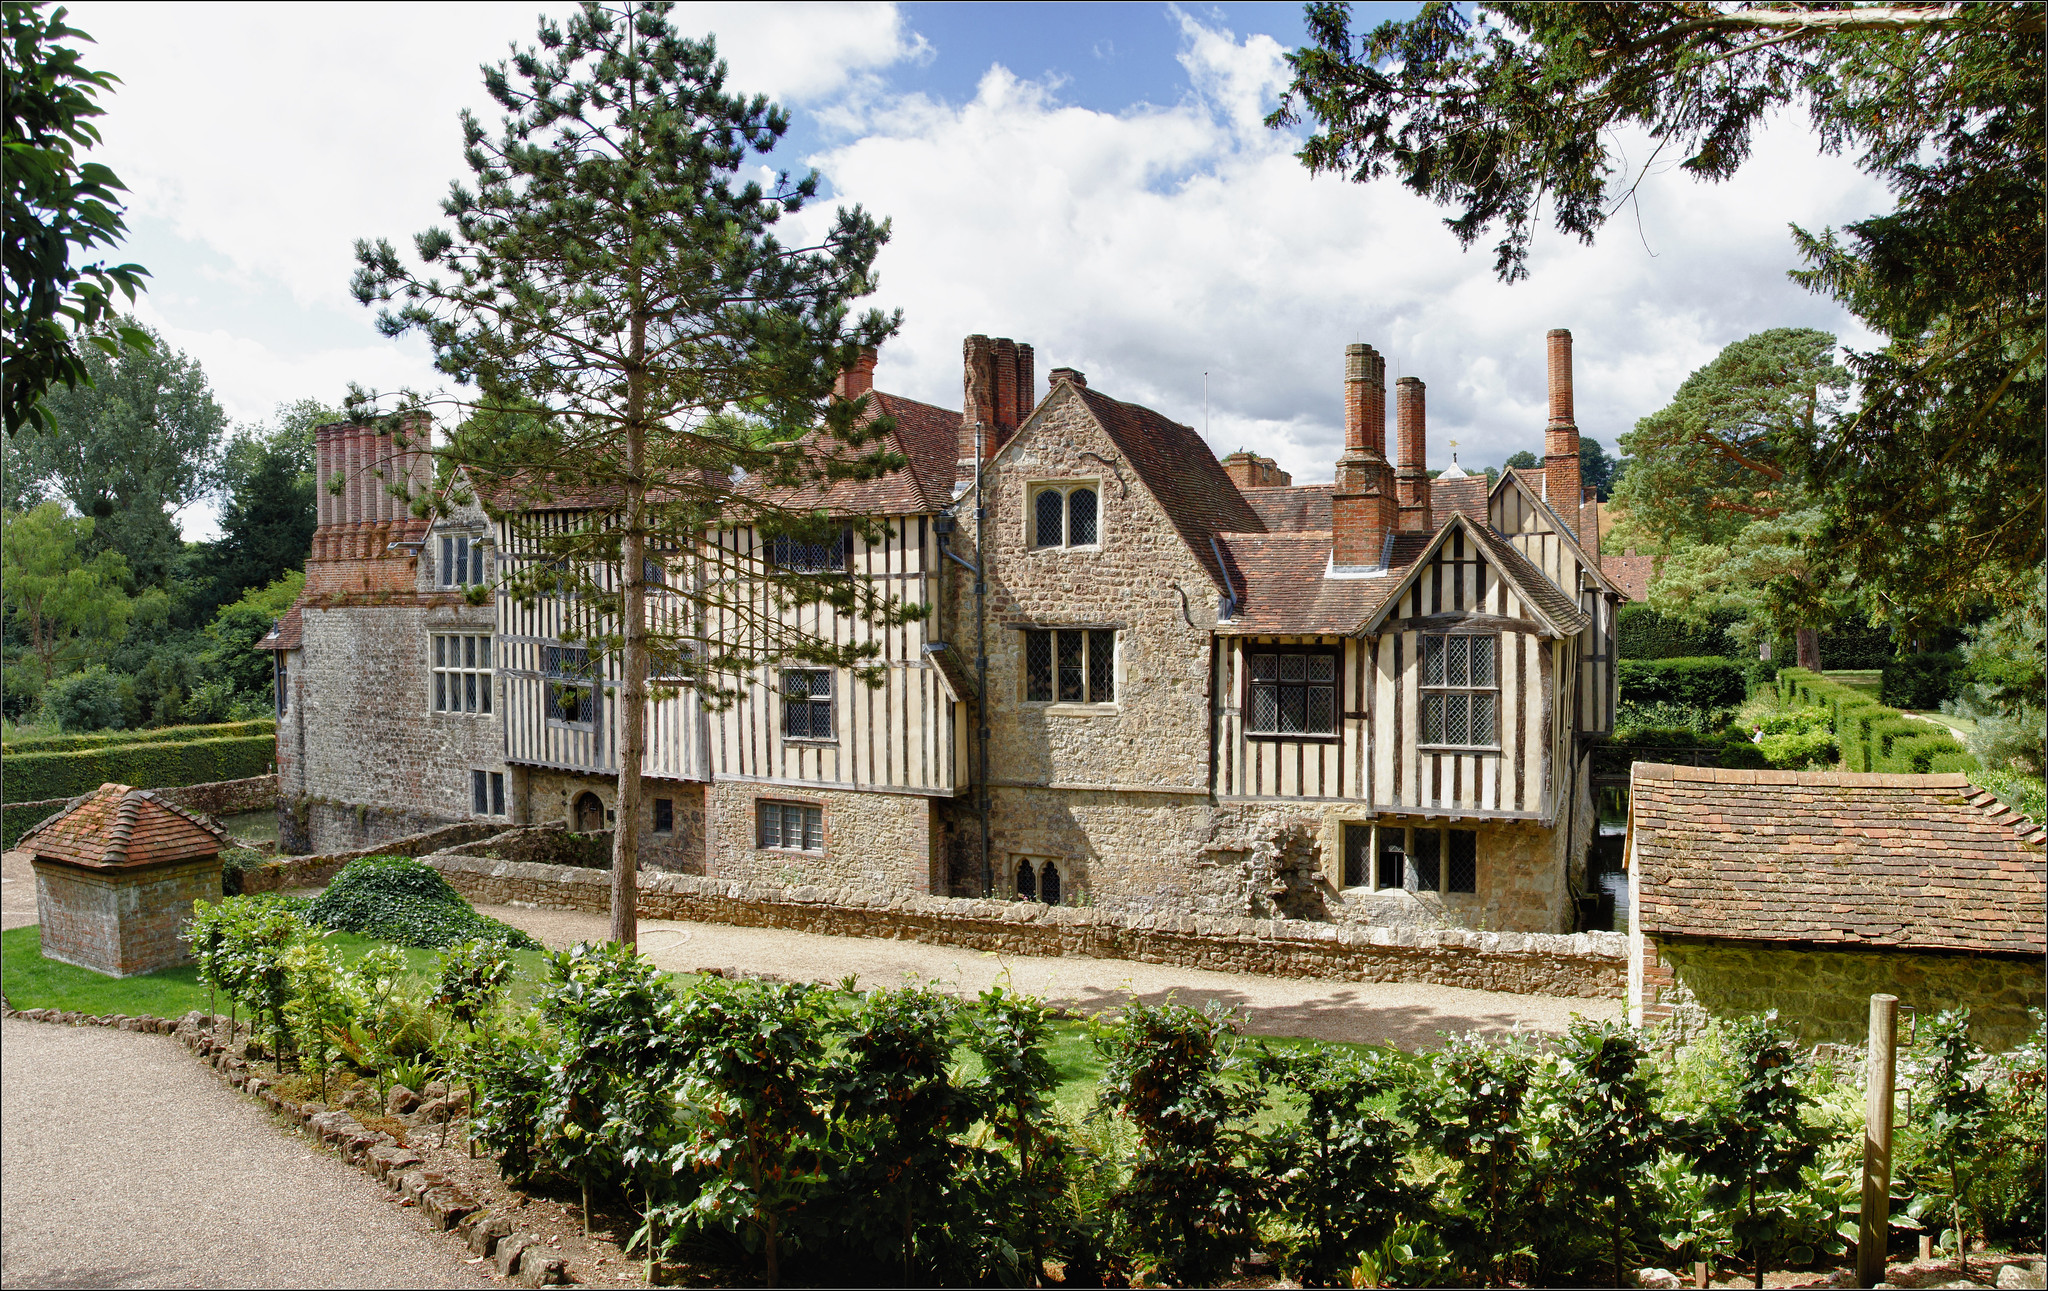 Ightham Mote, Ightham, Sevenoaks, Kent by Bert Kaufmann.jpg